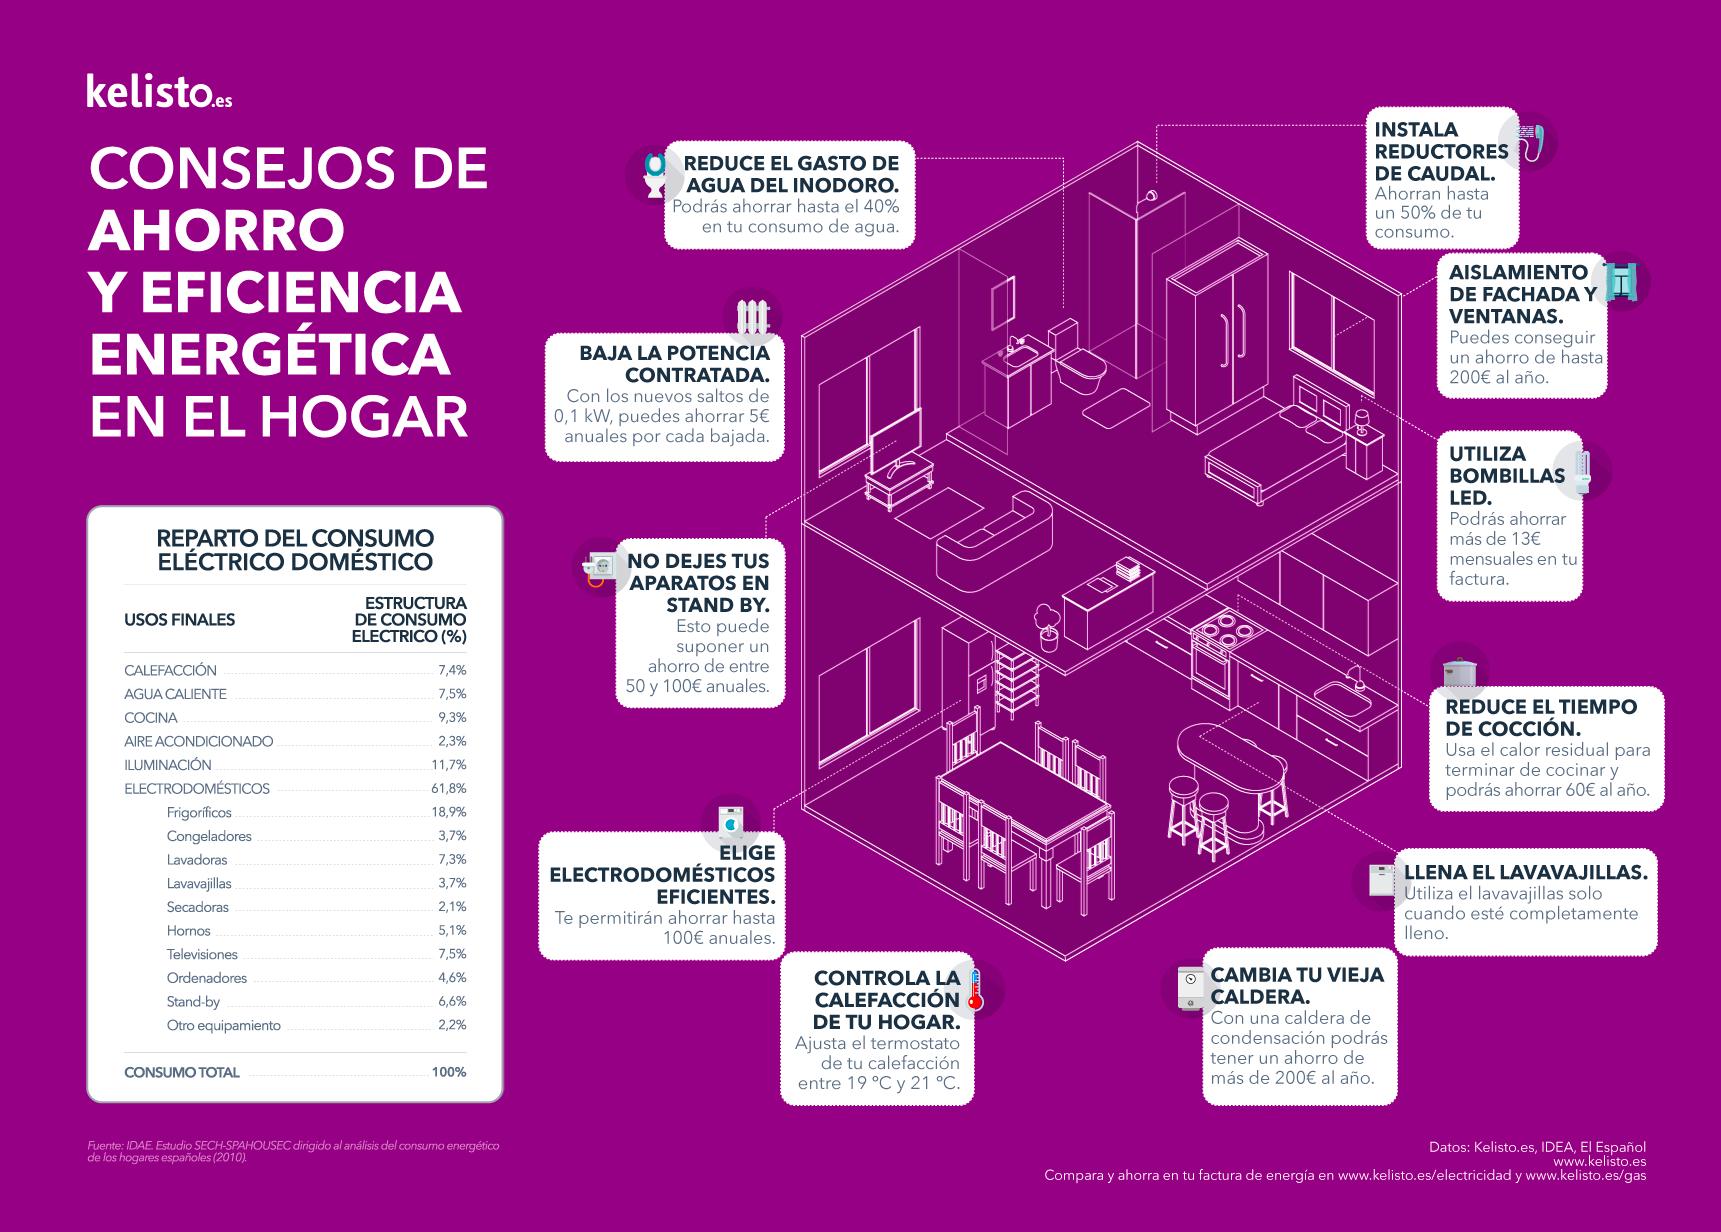 Infograf%c3%ada kelisto.es